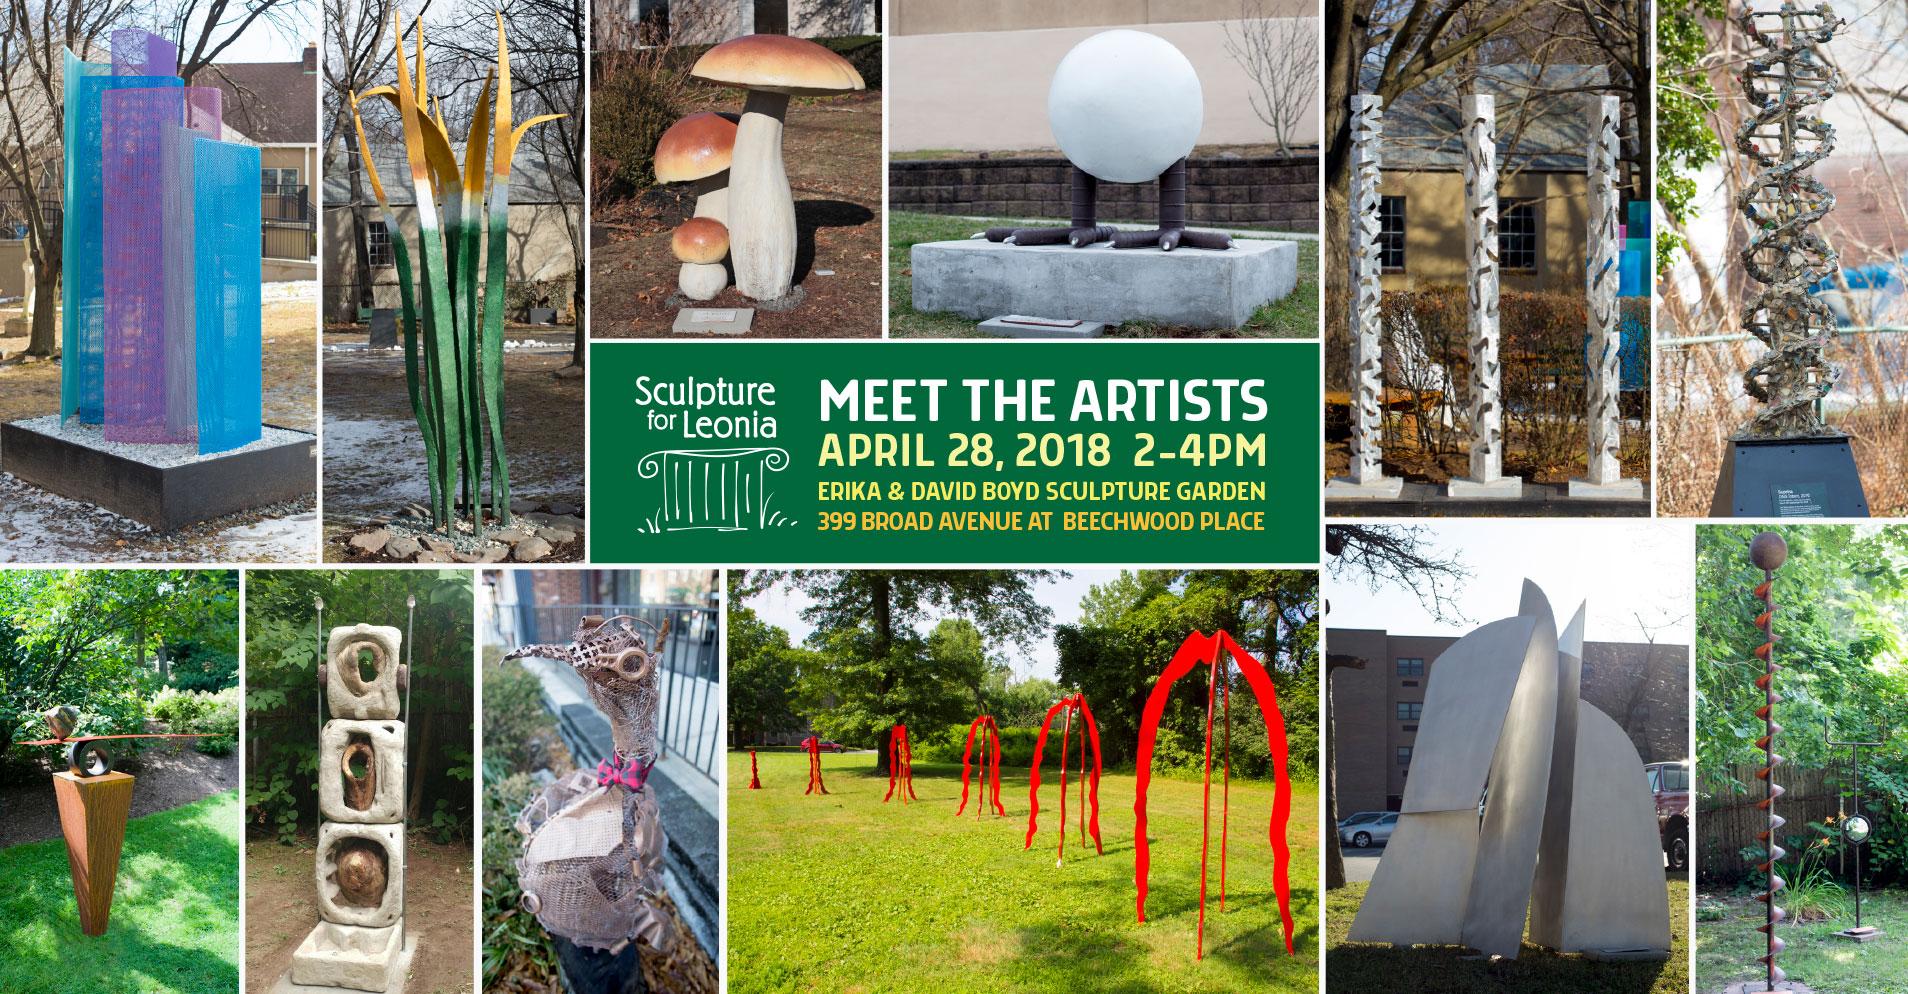 Meet the Artists: April 28, 2018 | SCULPTURE FOR LEONIA